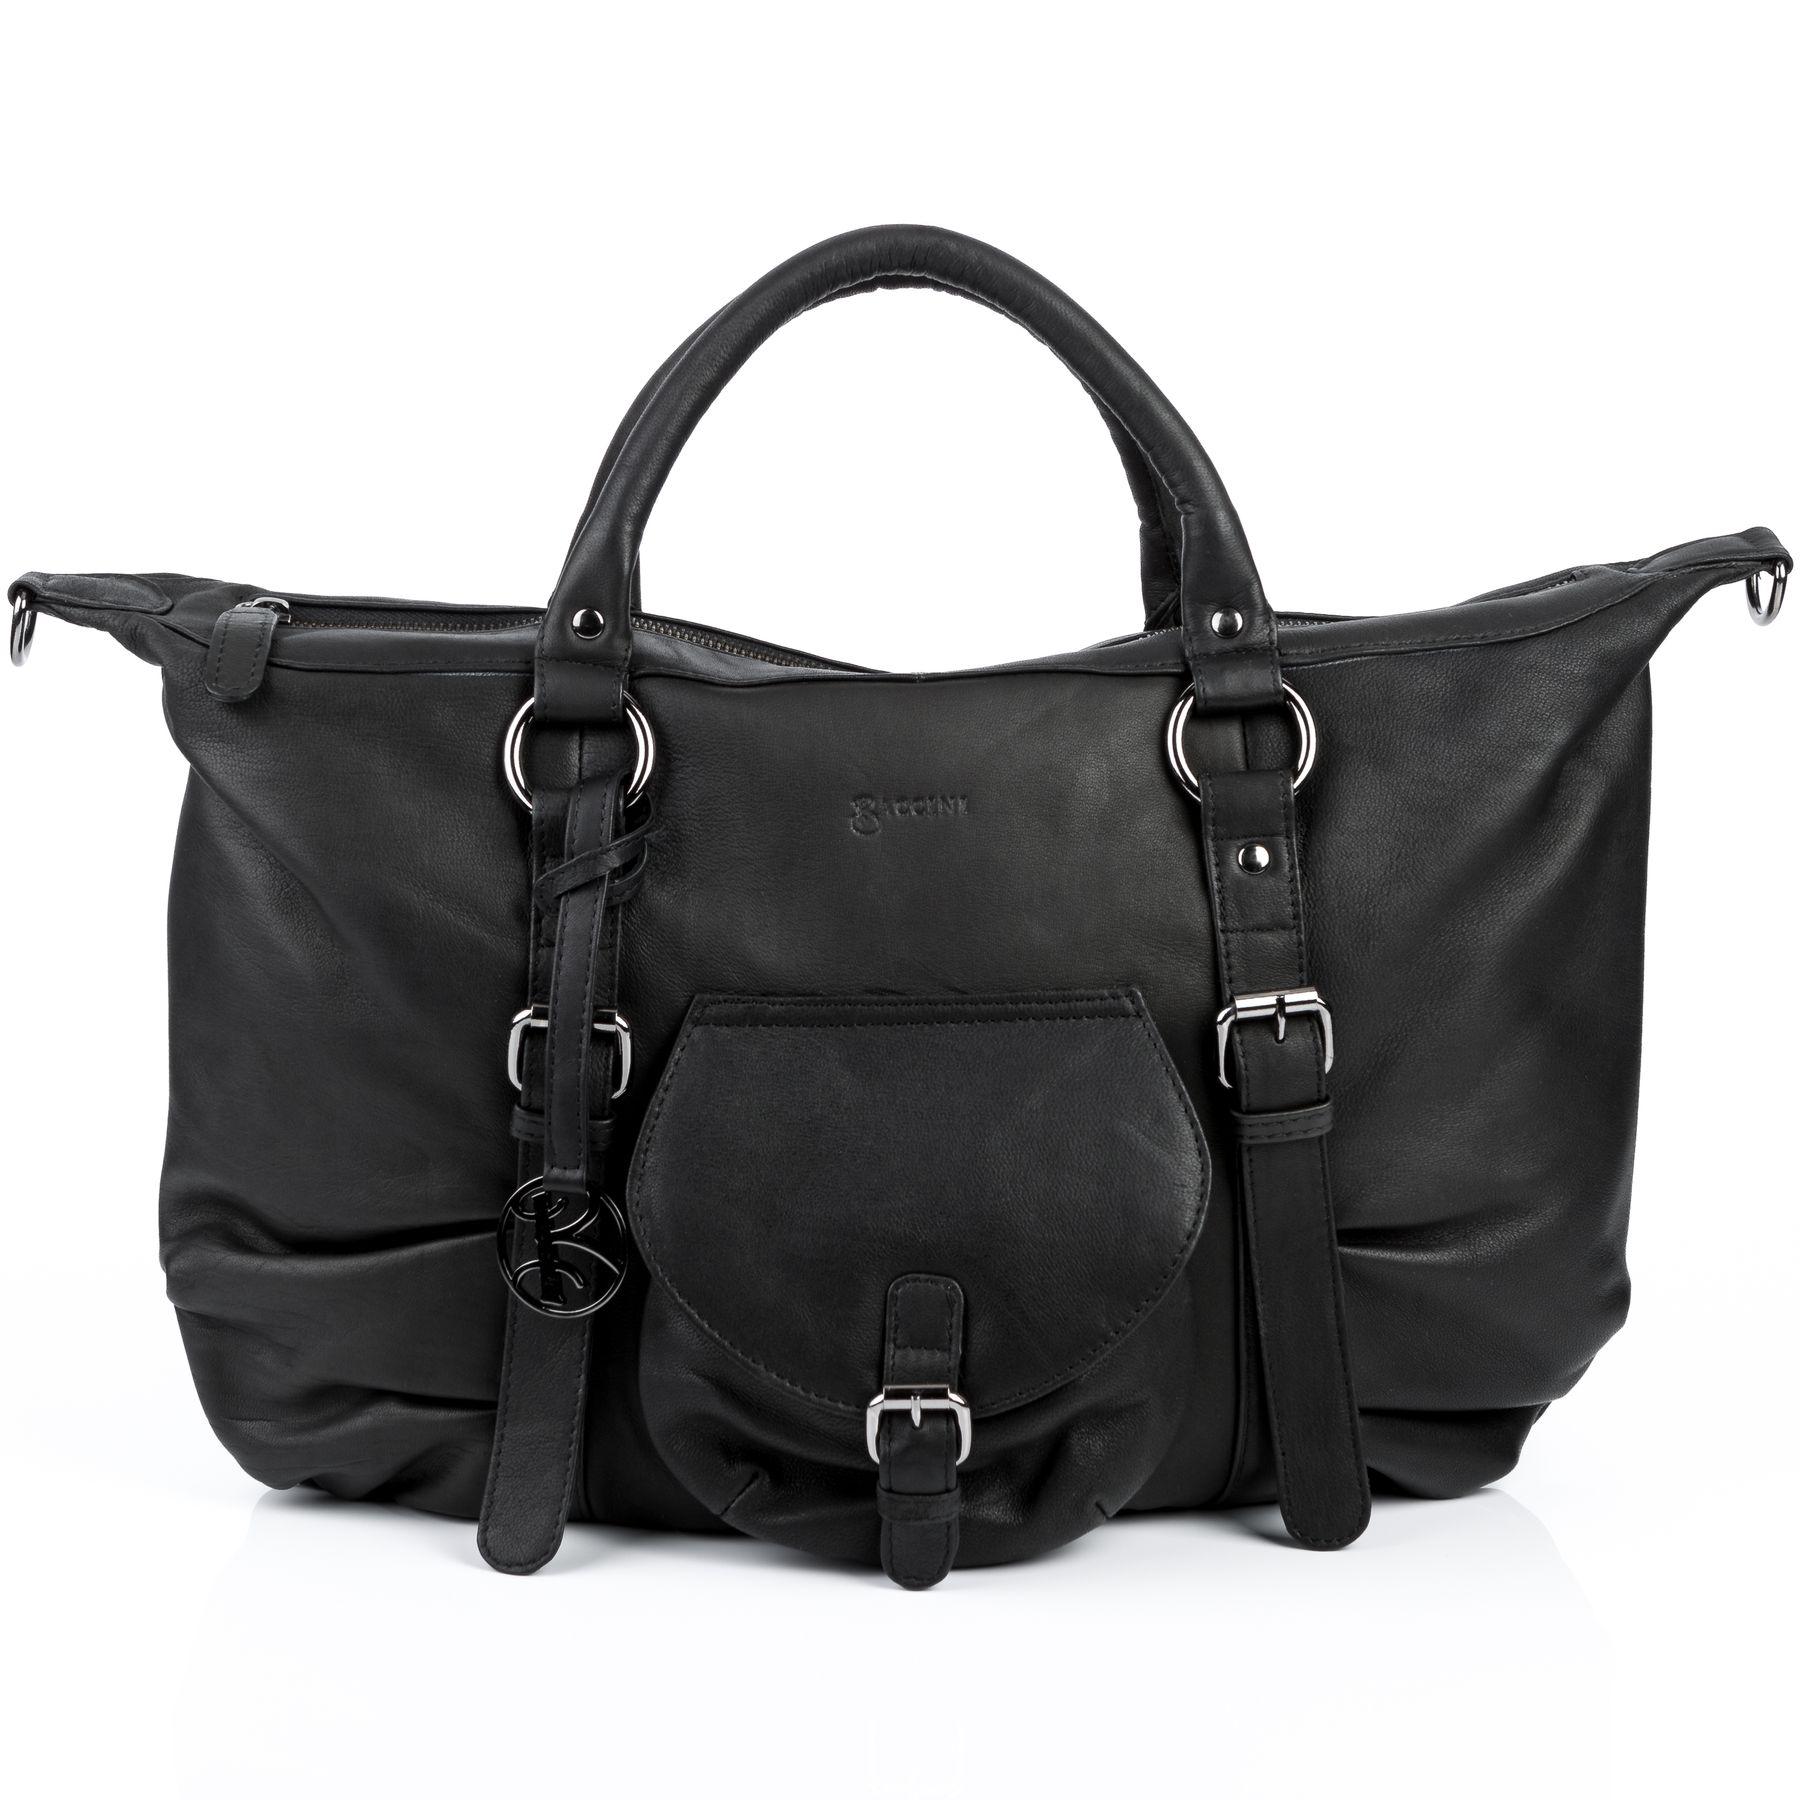 7dad4b856dfd5 BACCINI top-handle tote bag Sheep Leather ZOE black shoulder bag handbag  Bags Women s bags